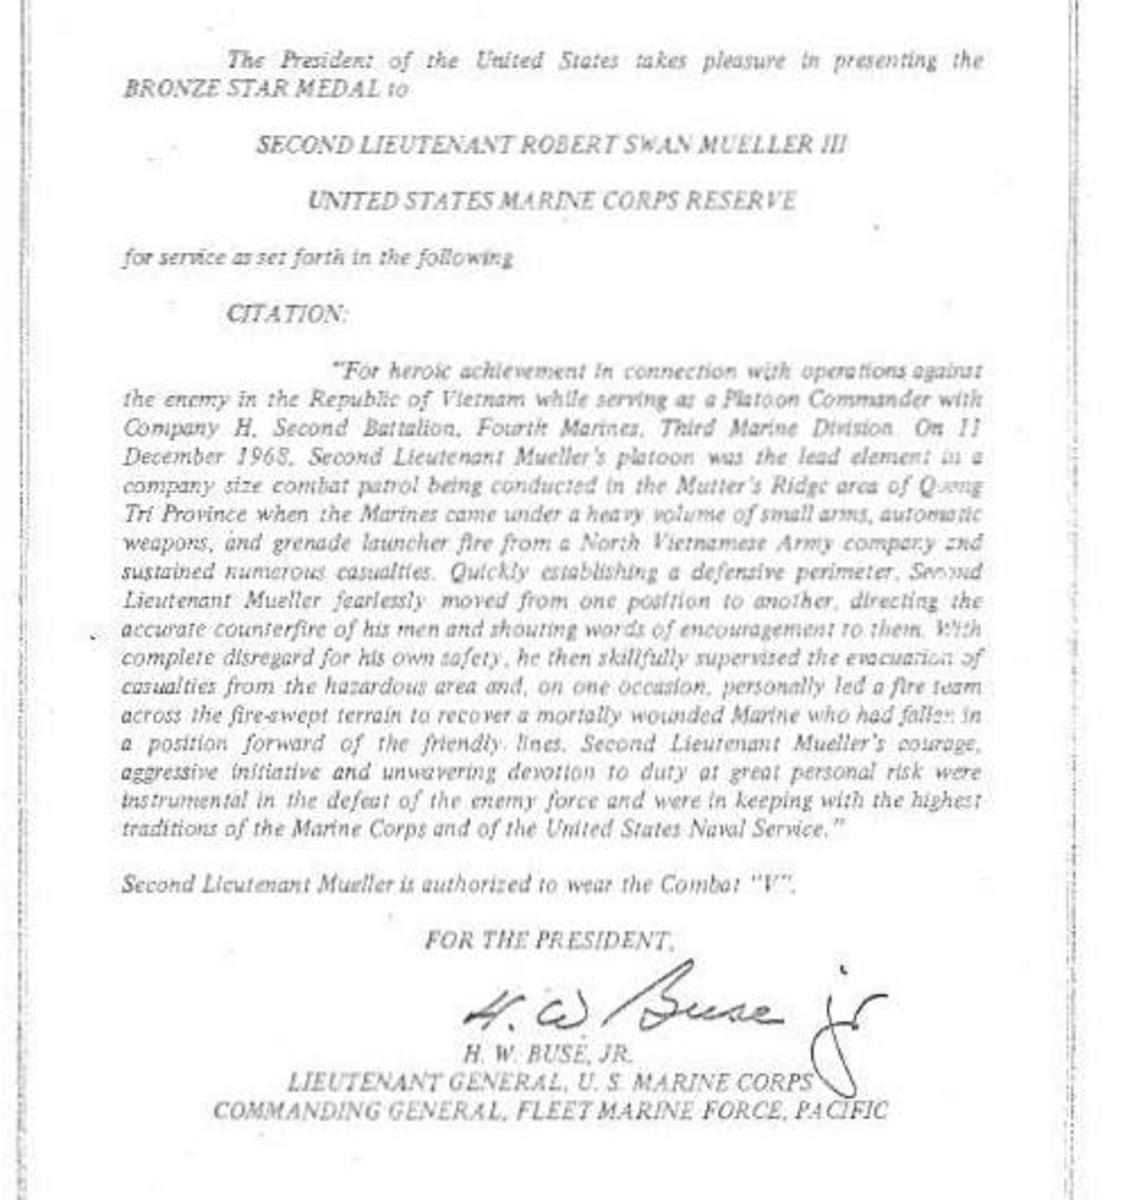 Lt. Mueller's Bronze Star Citation